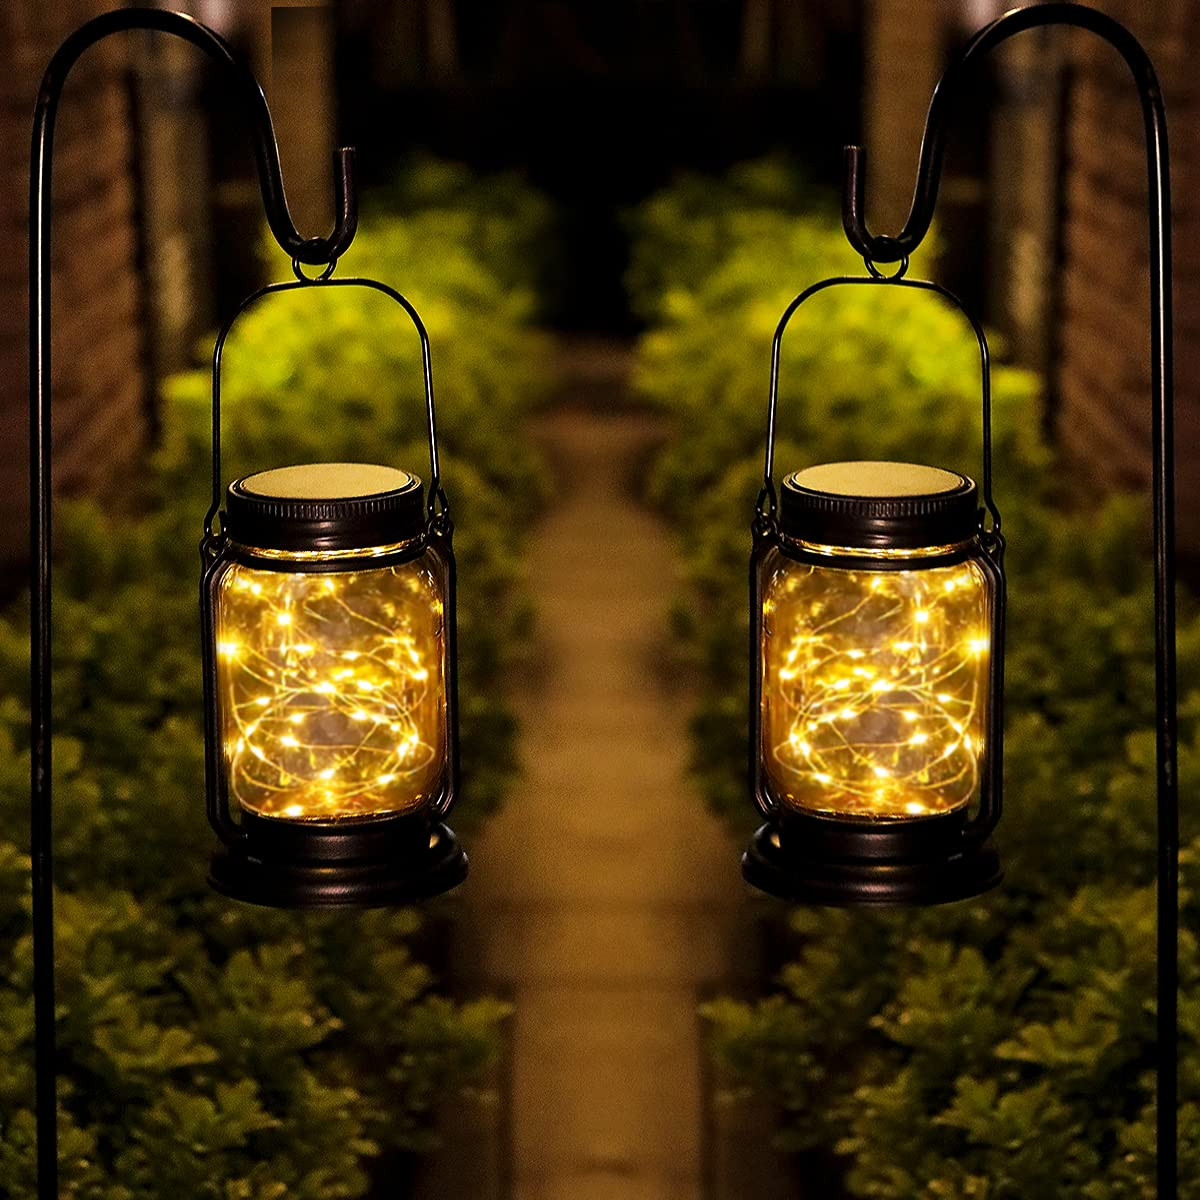 YUEFA Solar Lanterns Outdoor Waterproof